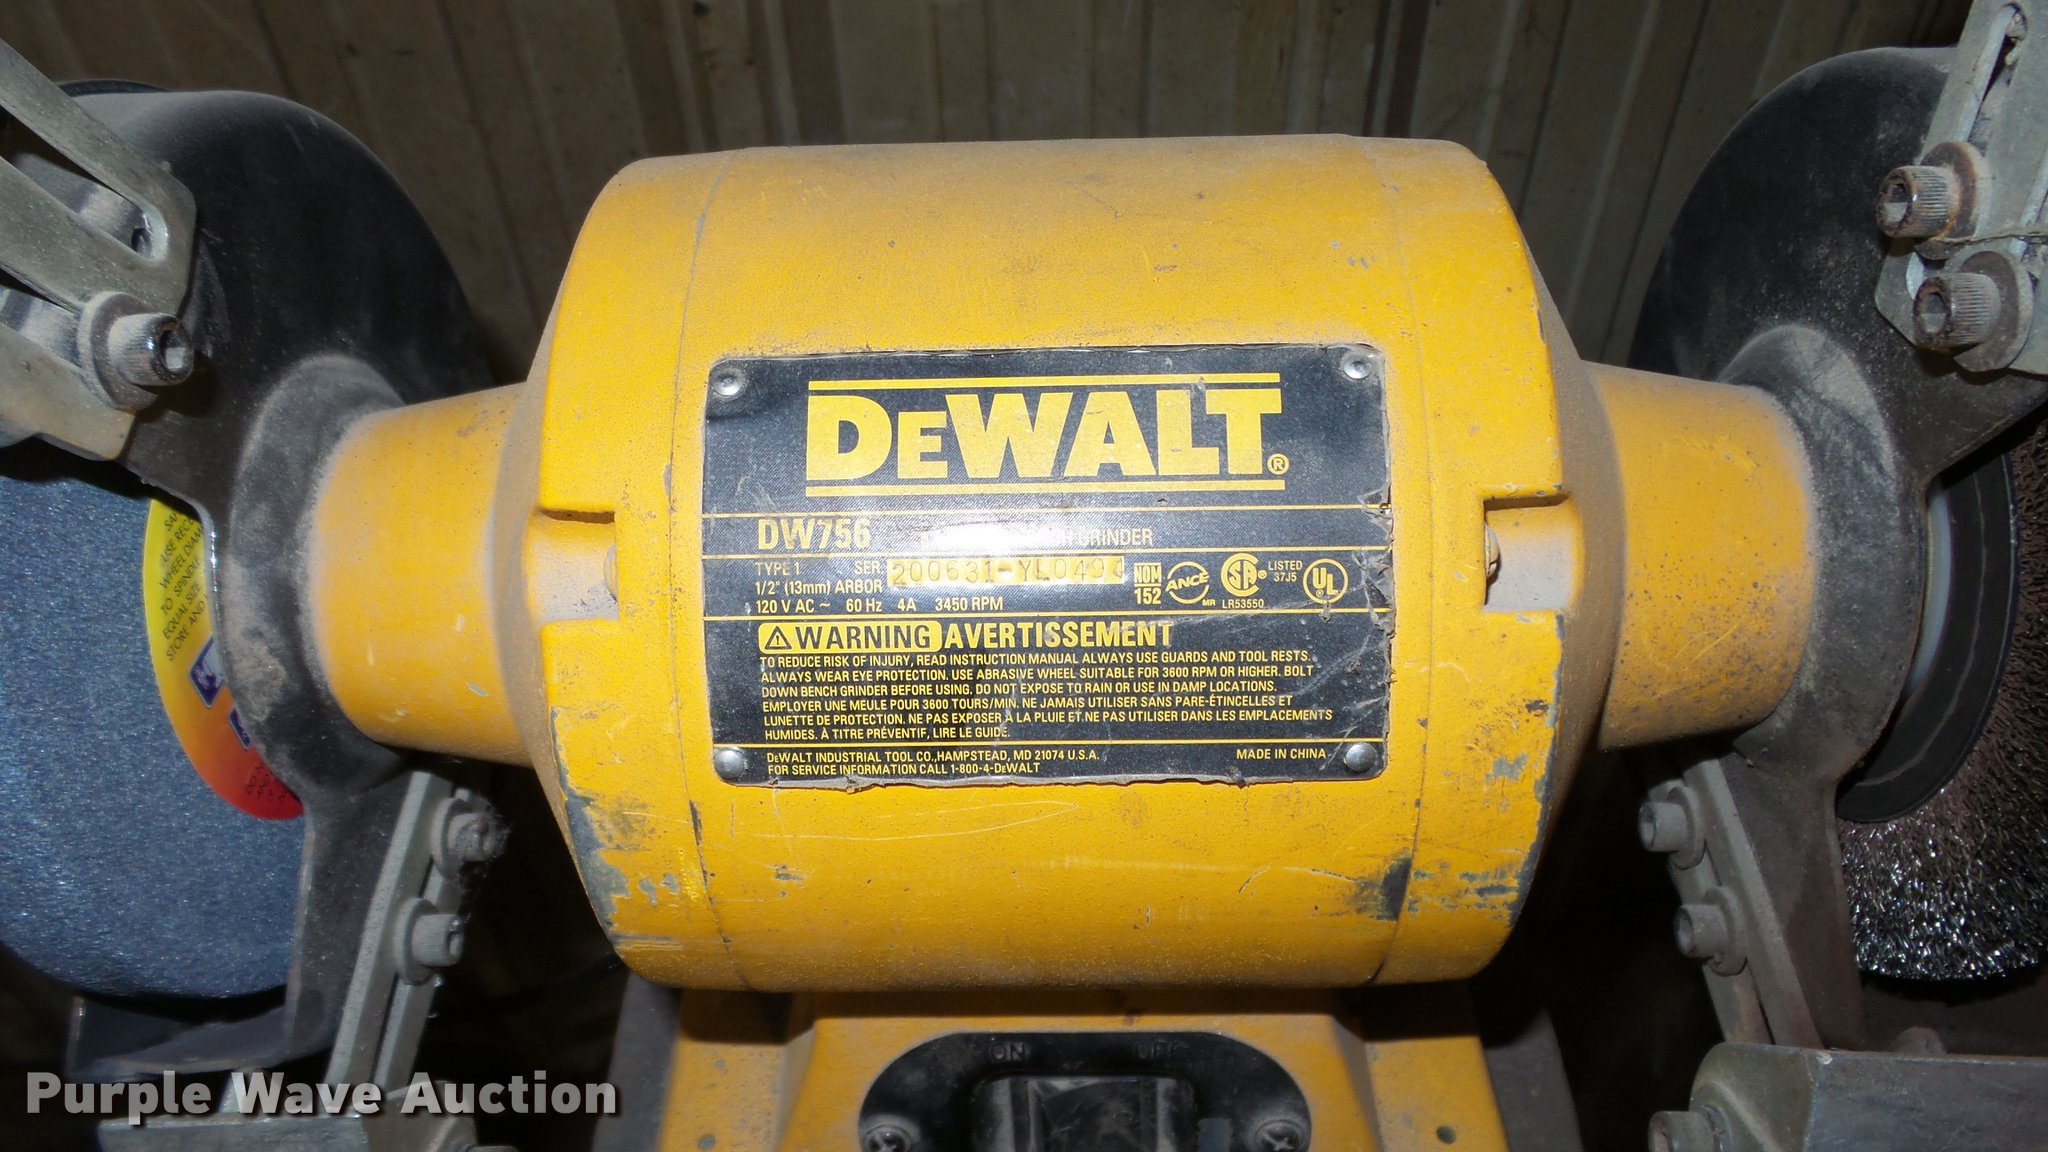 Astonishing Dewalt Dw756 Bench Grinder Item Dk9020 Sold February 13 Ibusinesslaw Wood Chair Design Ideas Ibusinesslaworg